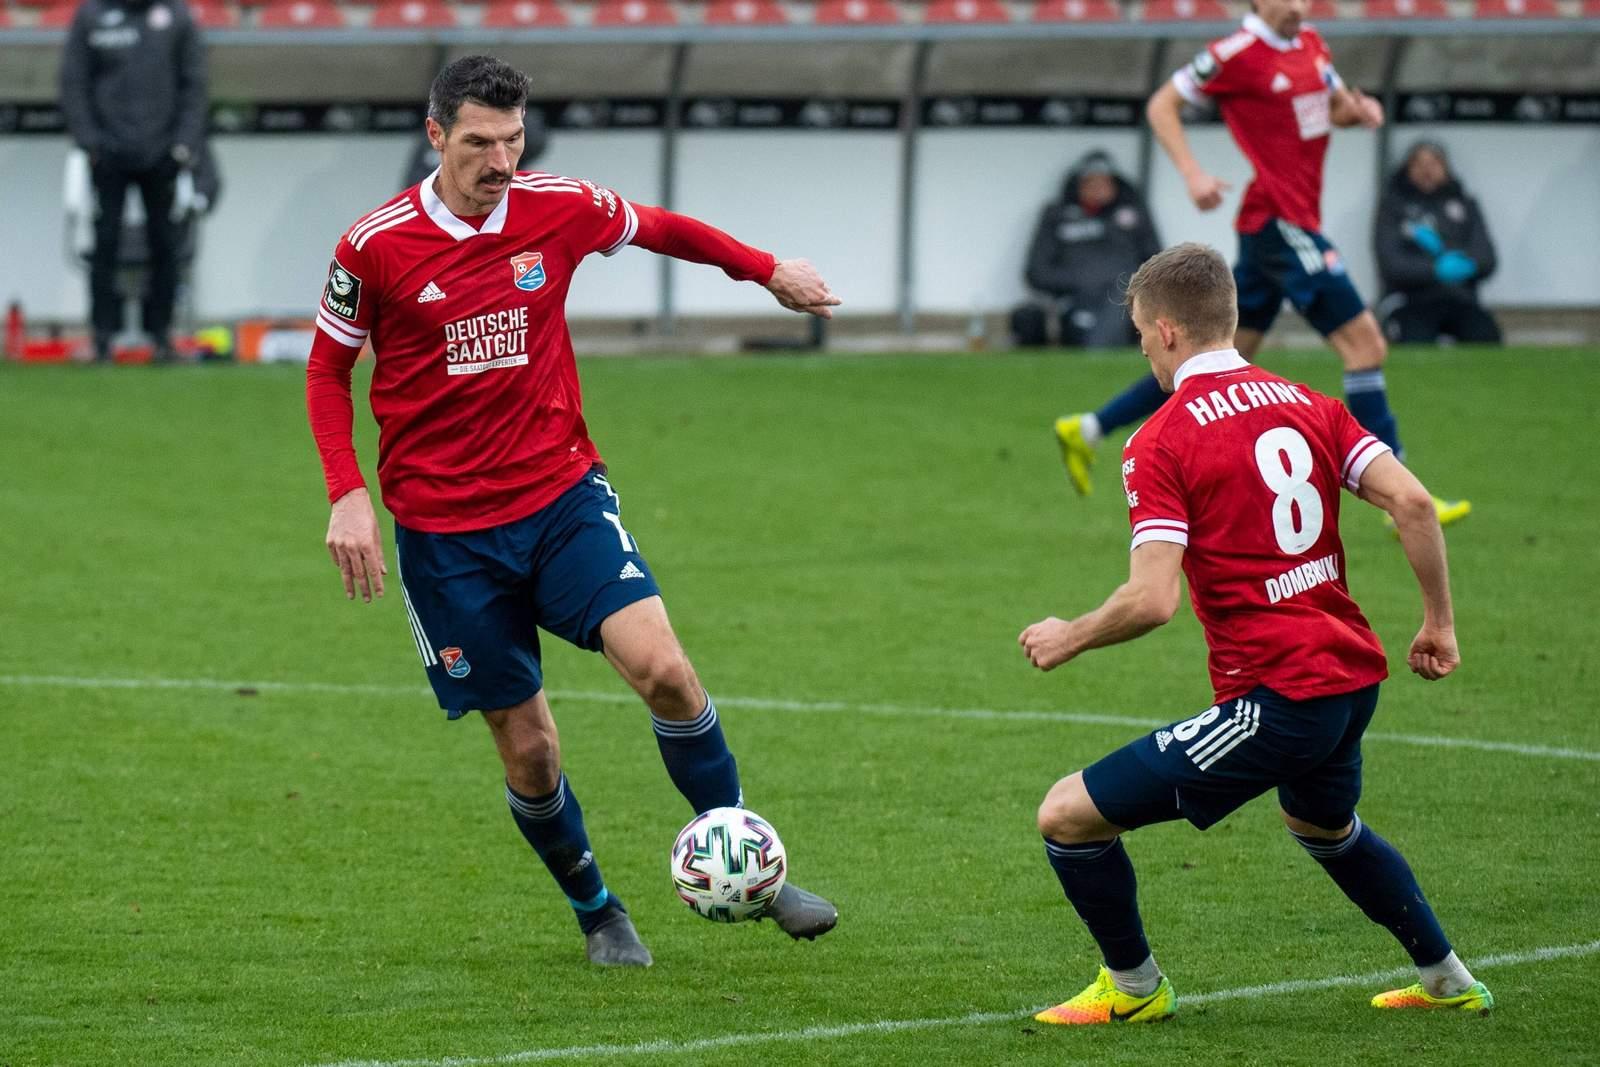 Dominik Stroh-Engel und Max Dombrowka gegen Wehen Wiesbaden.